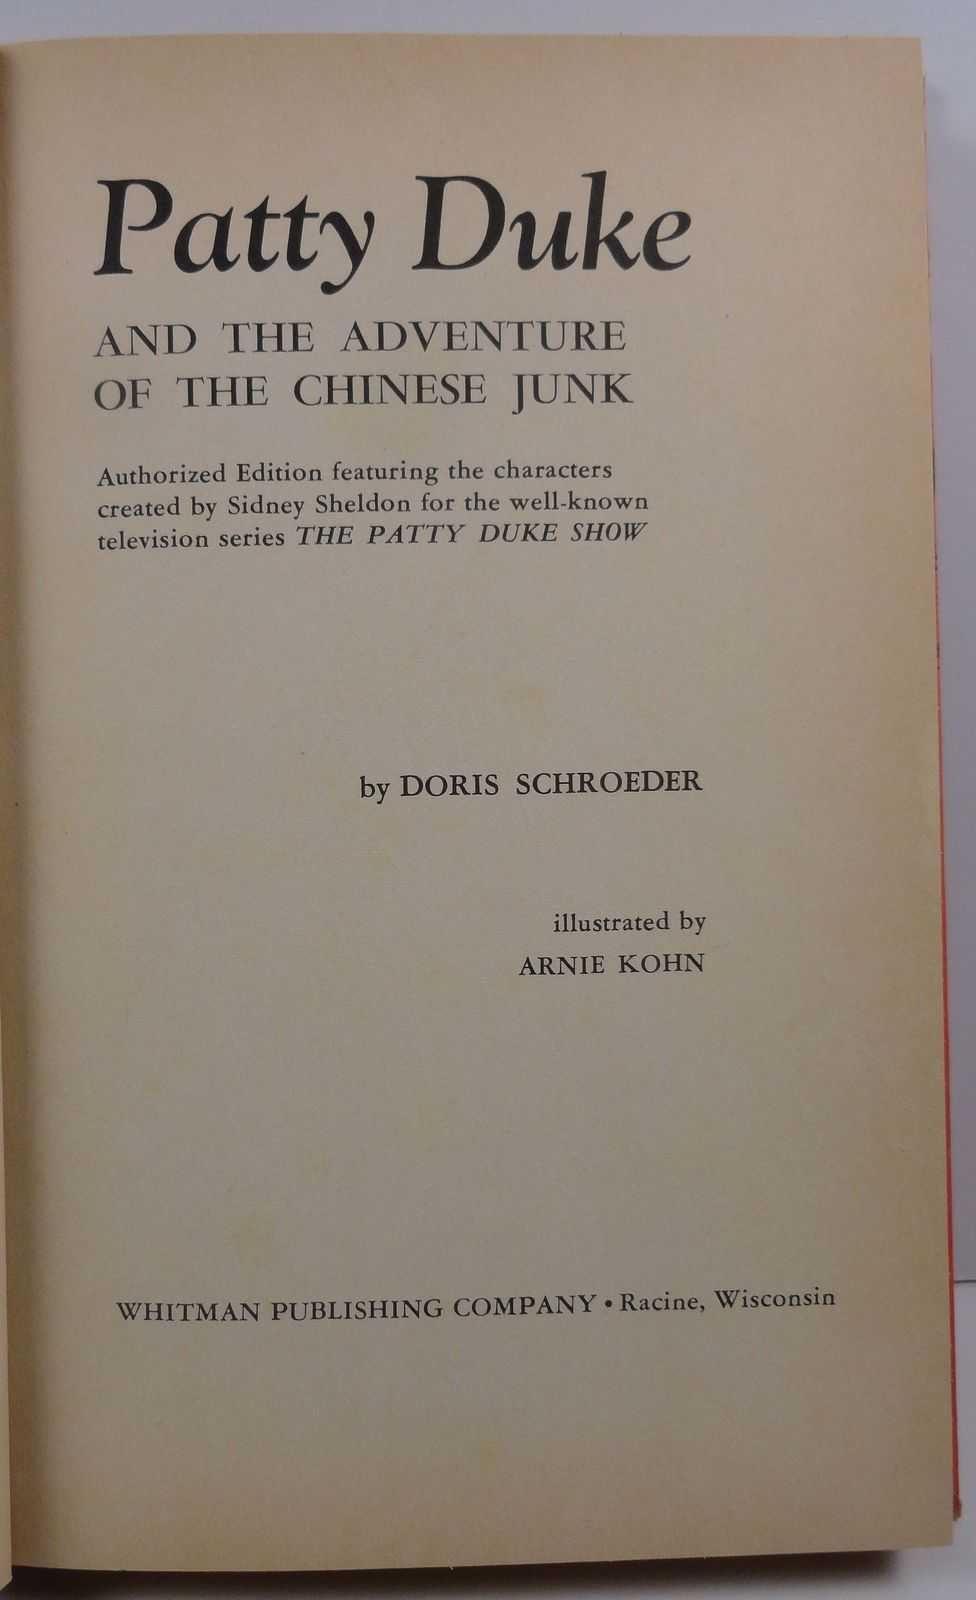 Patty Duke Adventure of the Chinese Junk Doris Schroeder